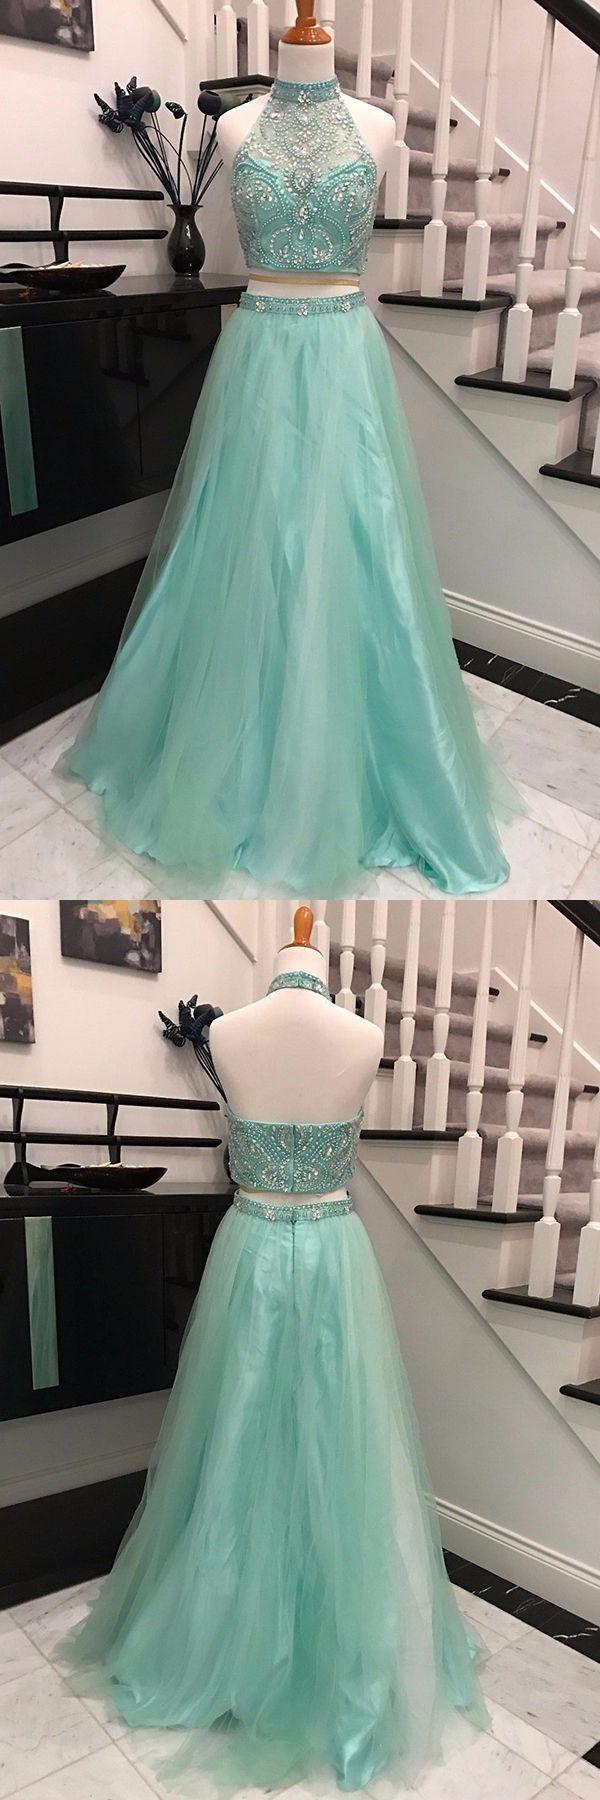 Mint prom dressesaline prom dresseshalter pieces prom prom